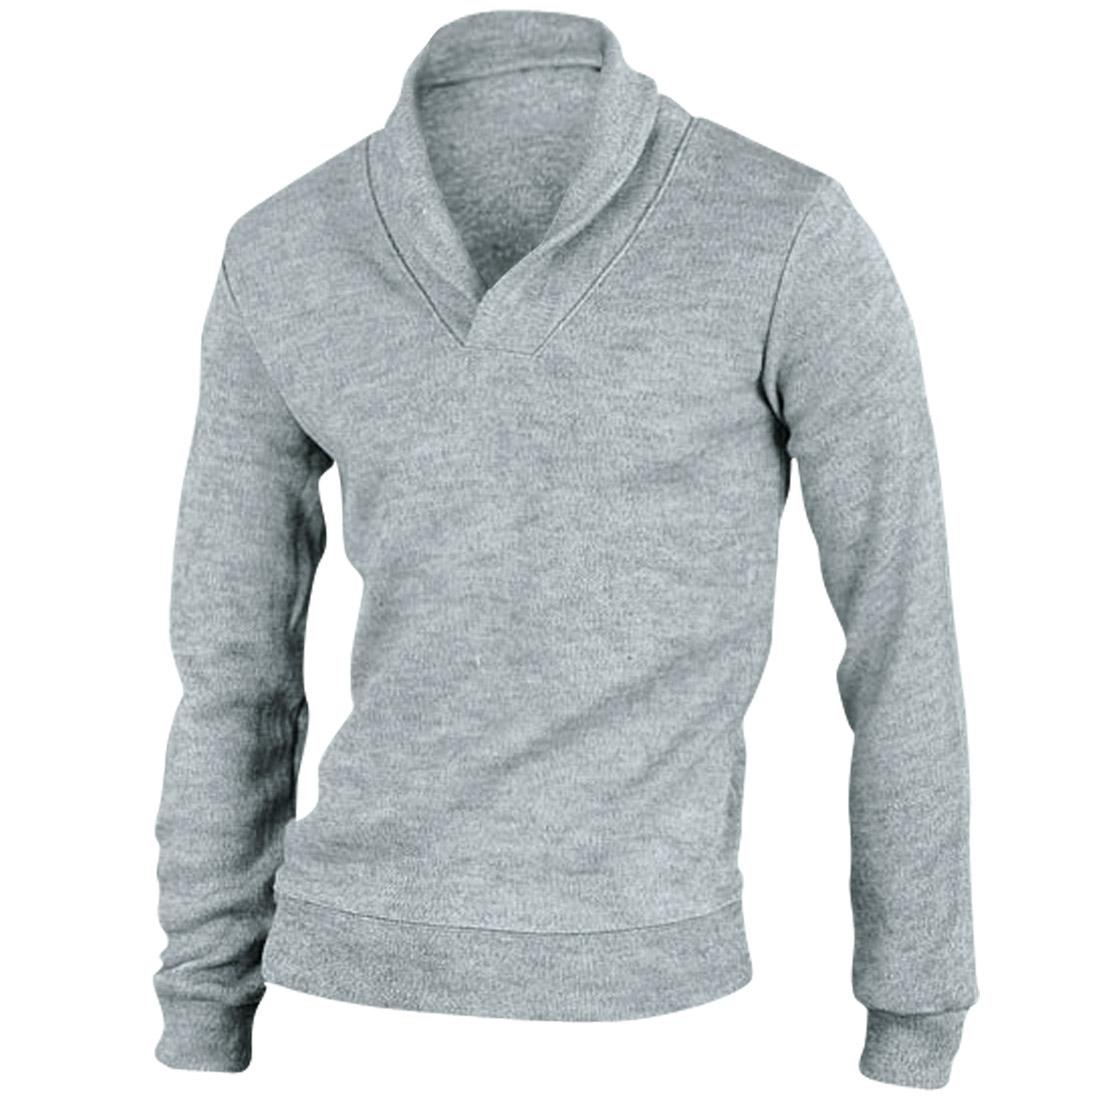 Men Fashion Stretchy Long Sleeved Light Gray Knit Shirt M